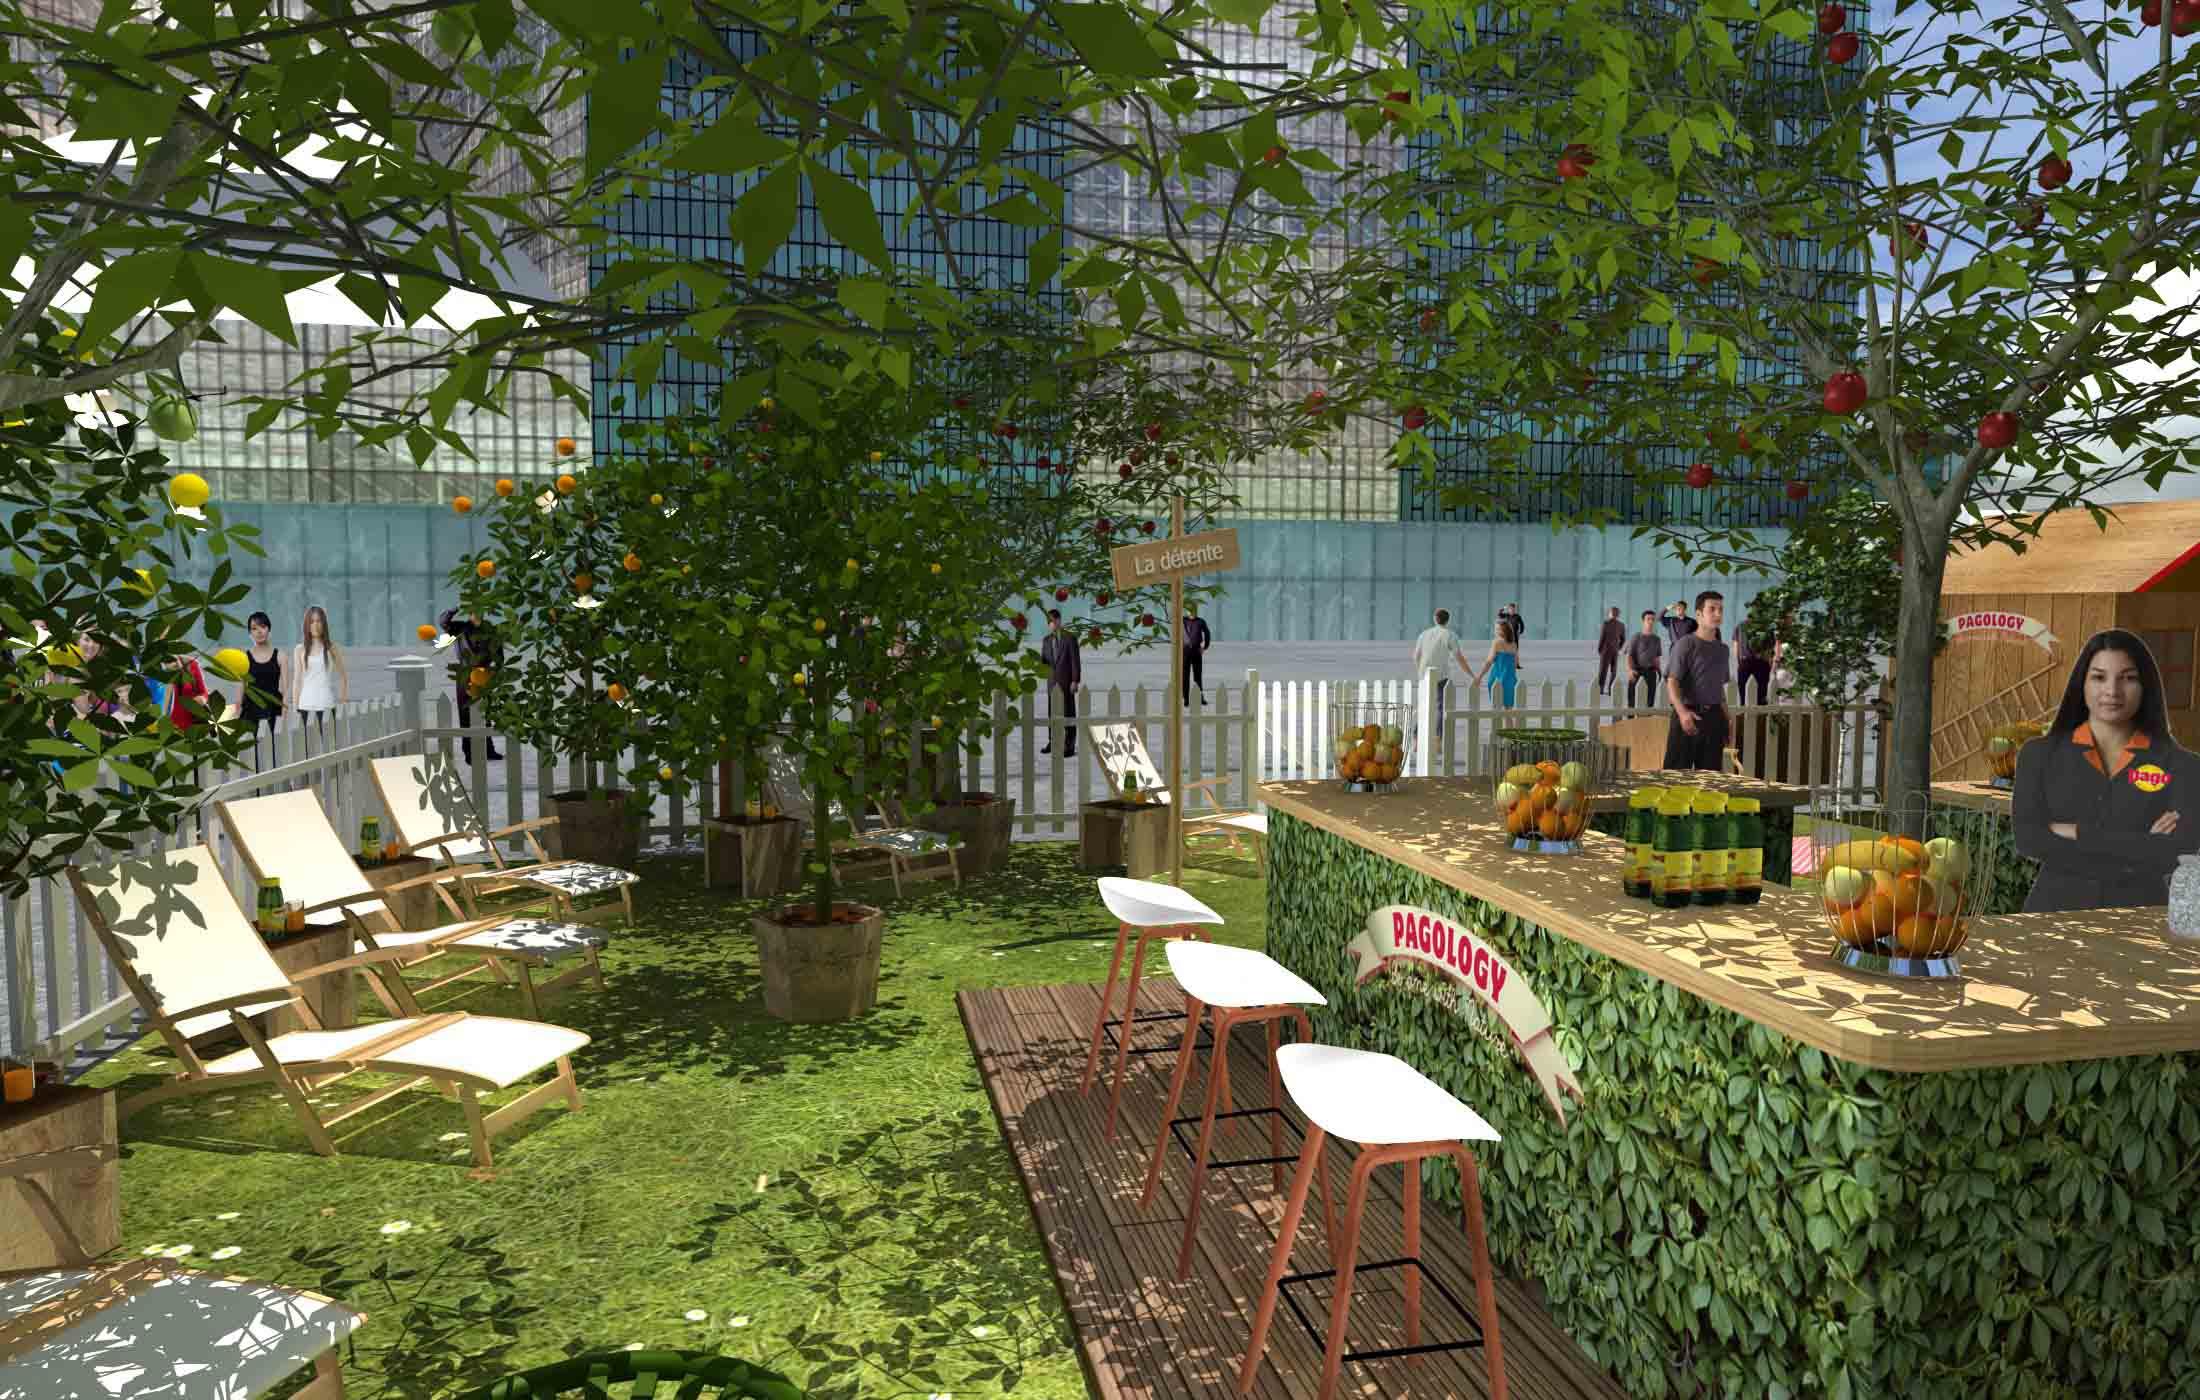 Pago installe un verger la d fense mademoiselle bon plan for Jardin urbain green bar